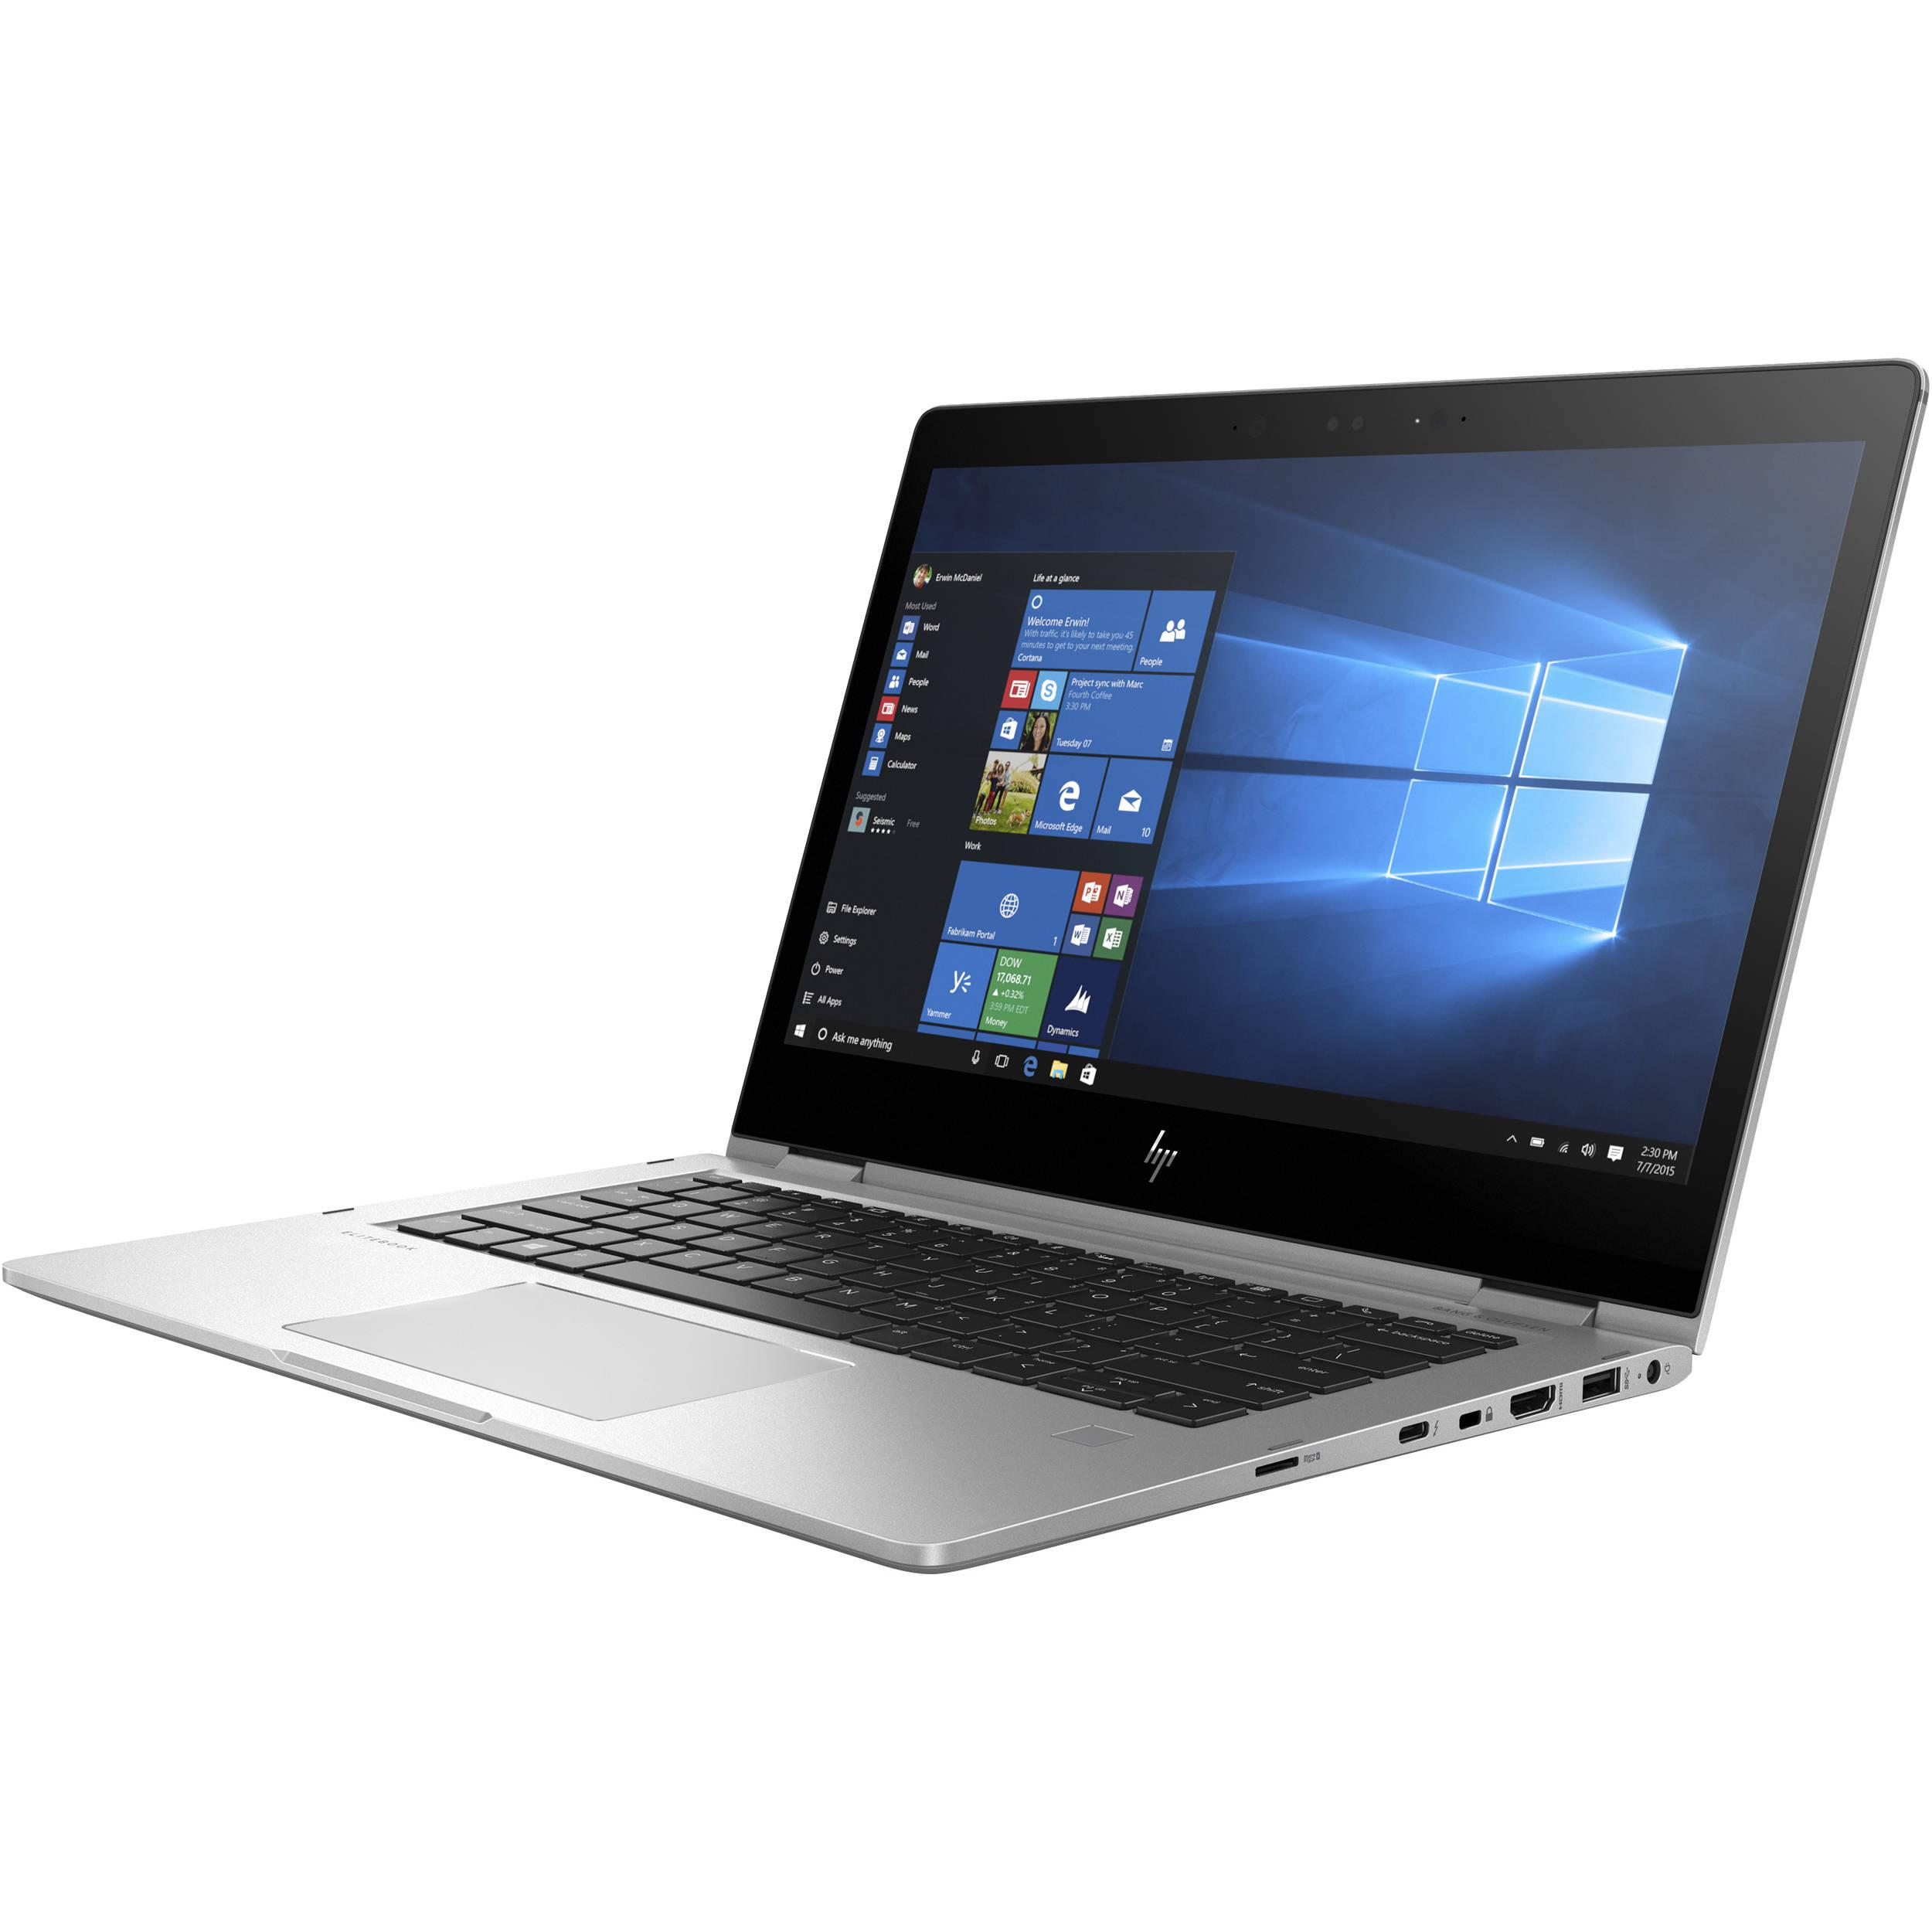 "HP Elitebook X360 1030 G2 13"" Core i5 2.6 GHz - SSD 128 GB - 8 GB QWERTY - English (US)"